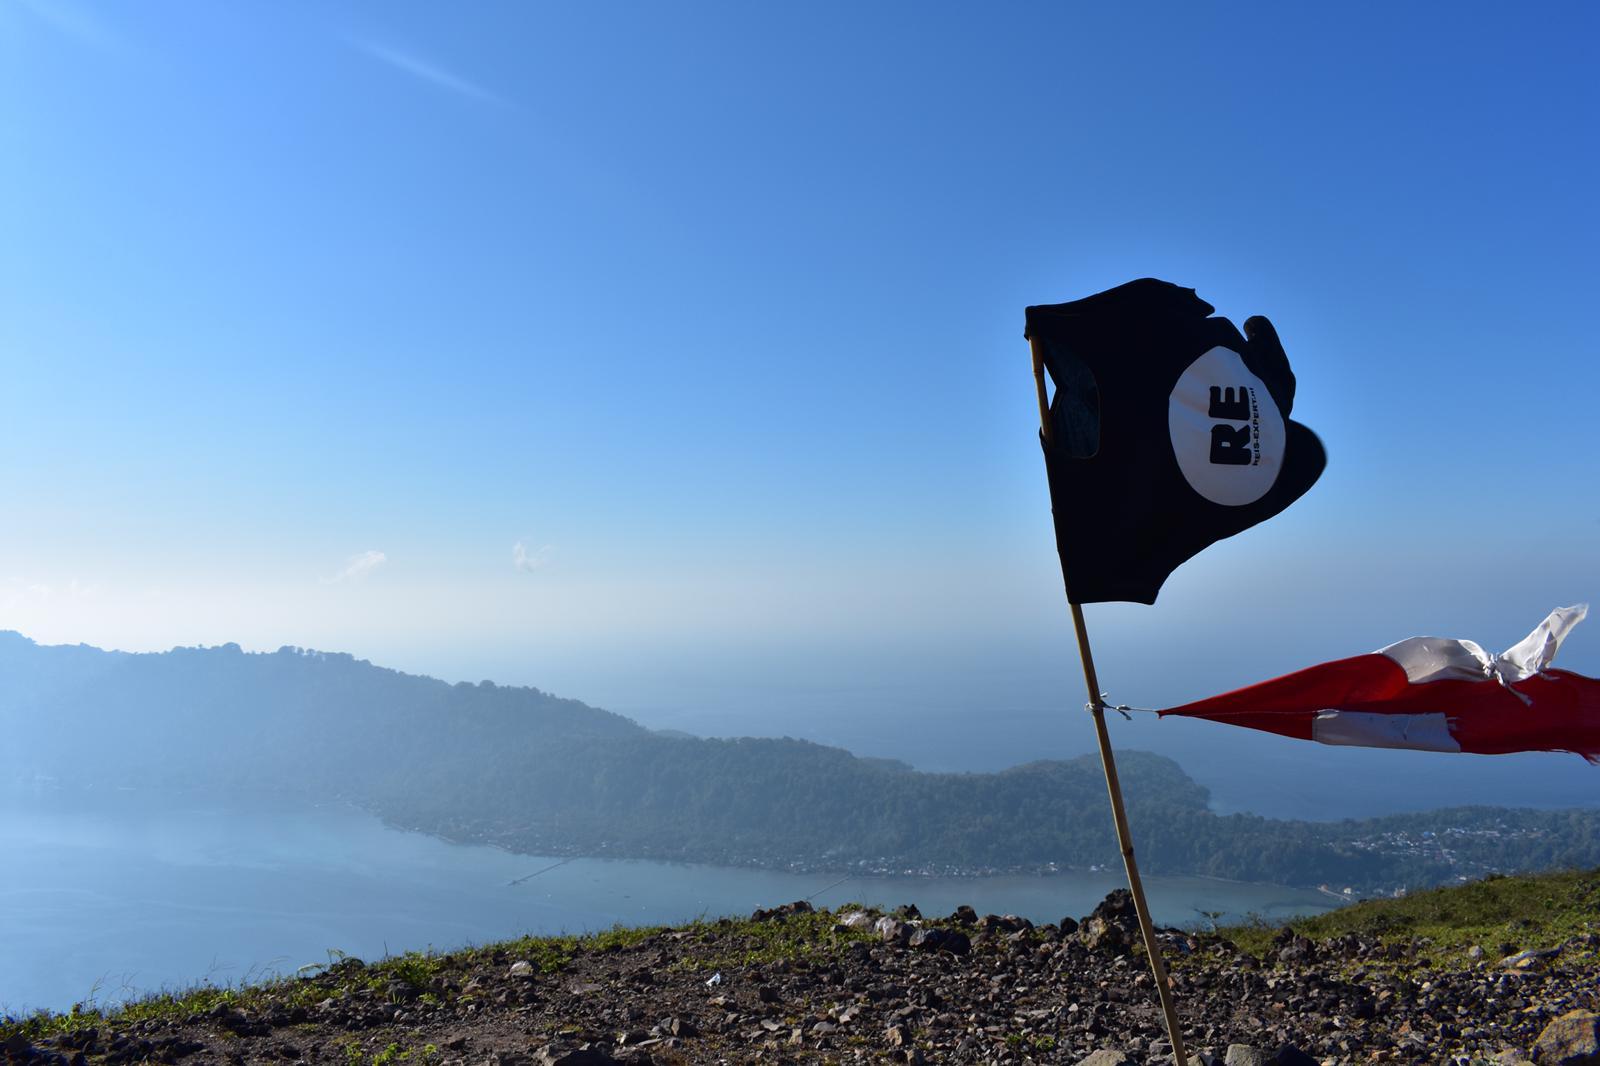 Gunung Api, Banda eilanden